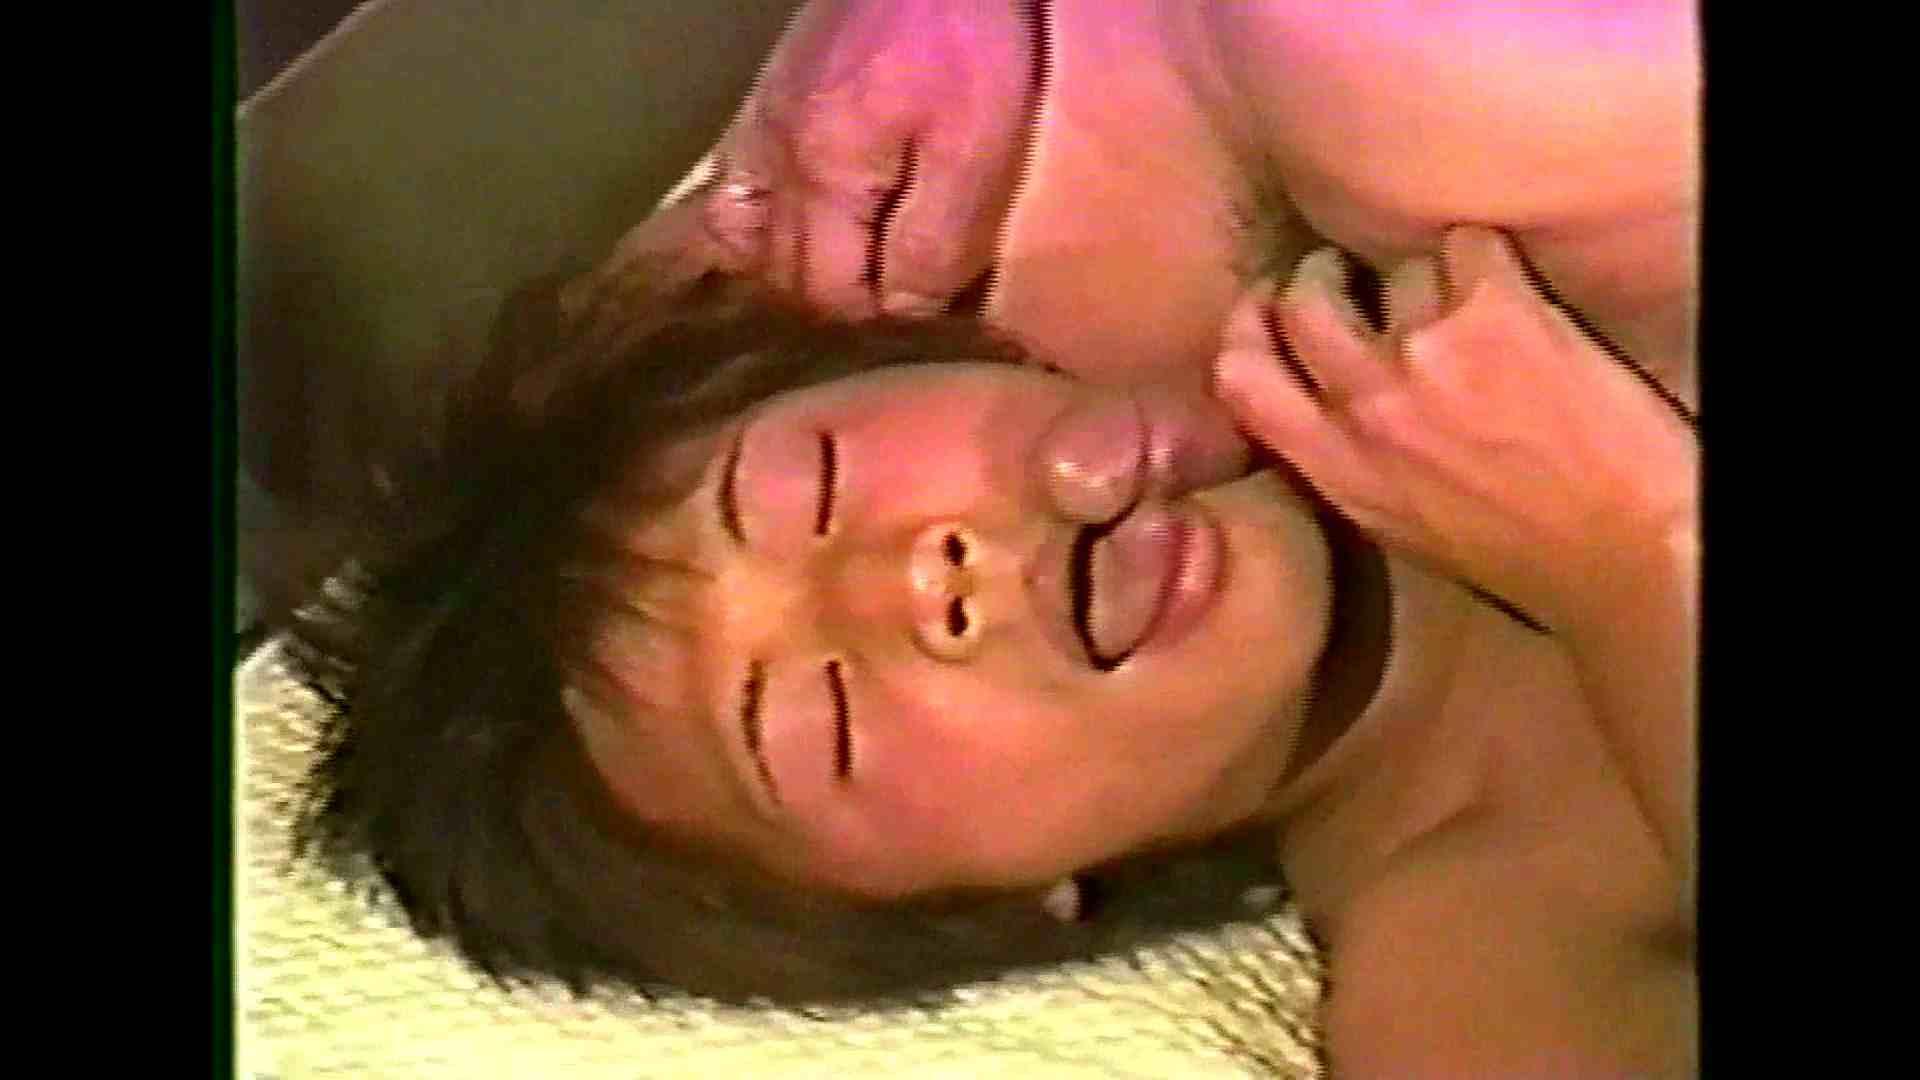 GAYBOY宏のオカズ倉庫Vol.3-2 フェラ ゲイ素人エロ画像 61枚 16